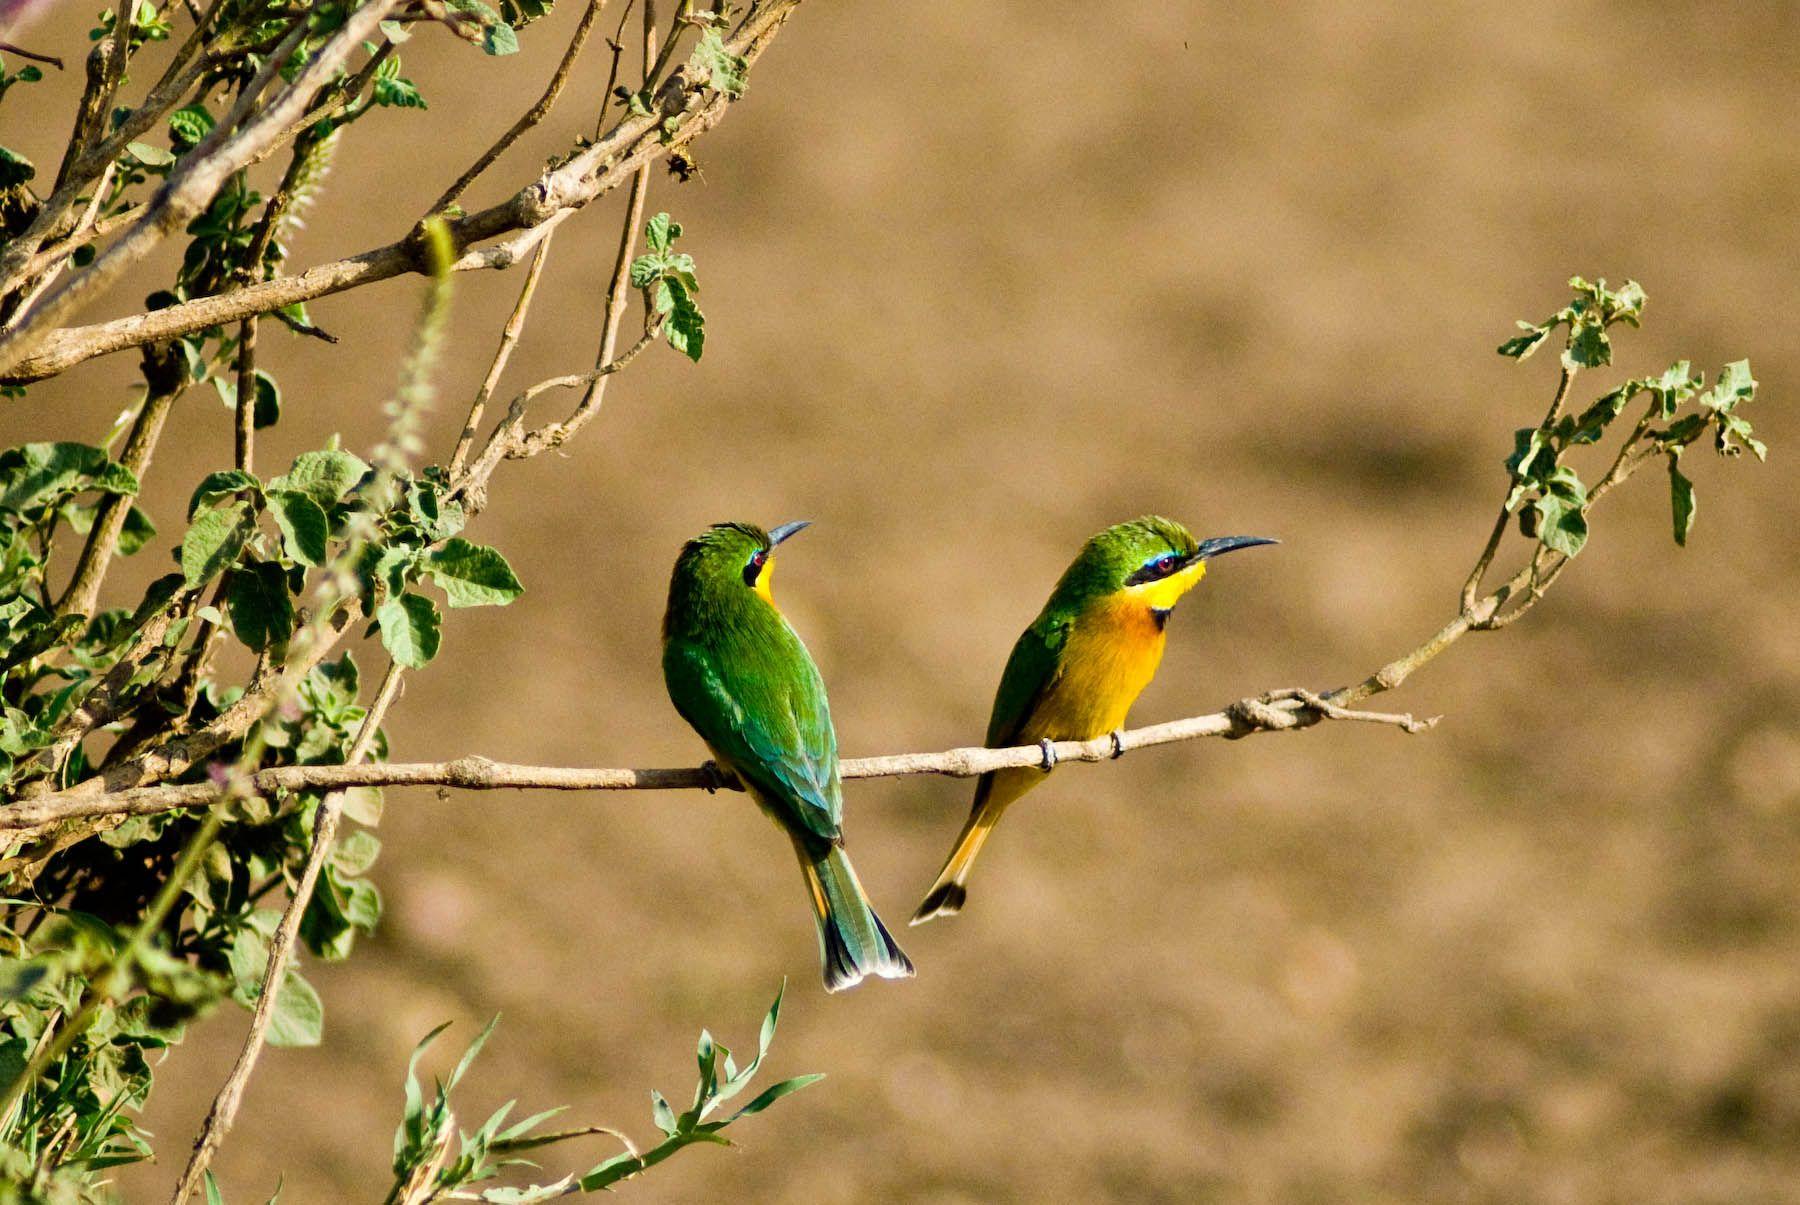 Tanzania - photo by LR